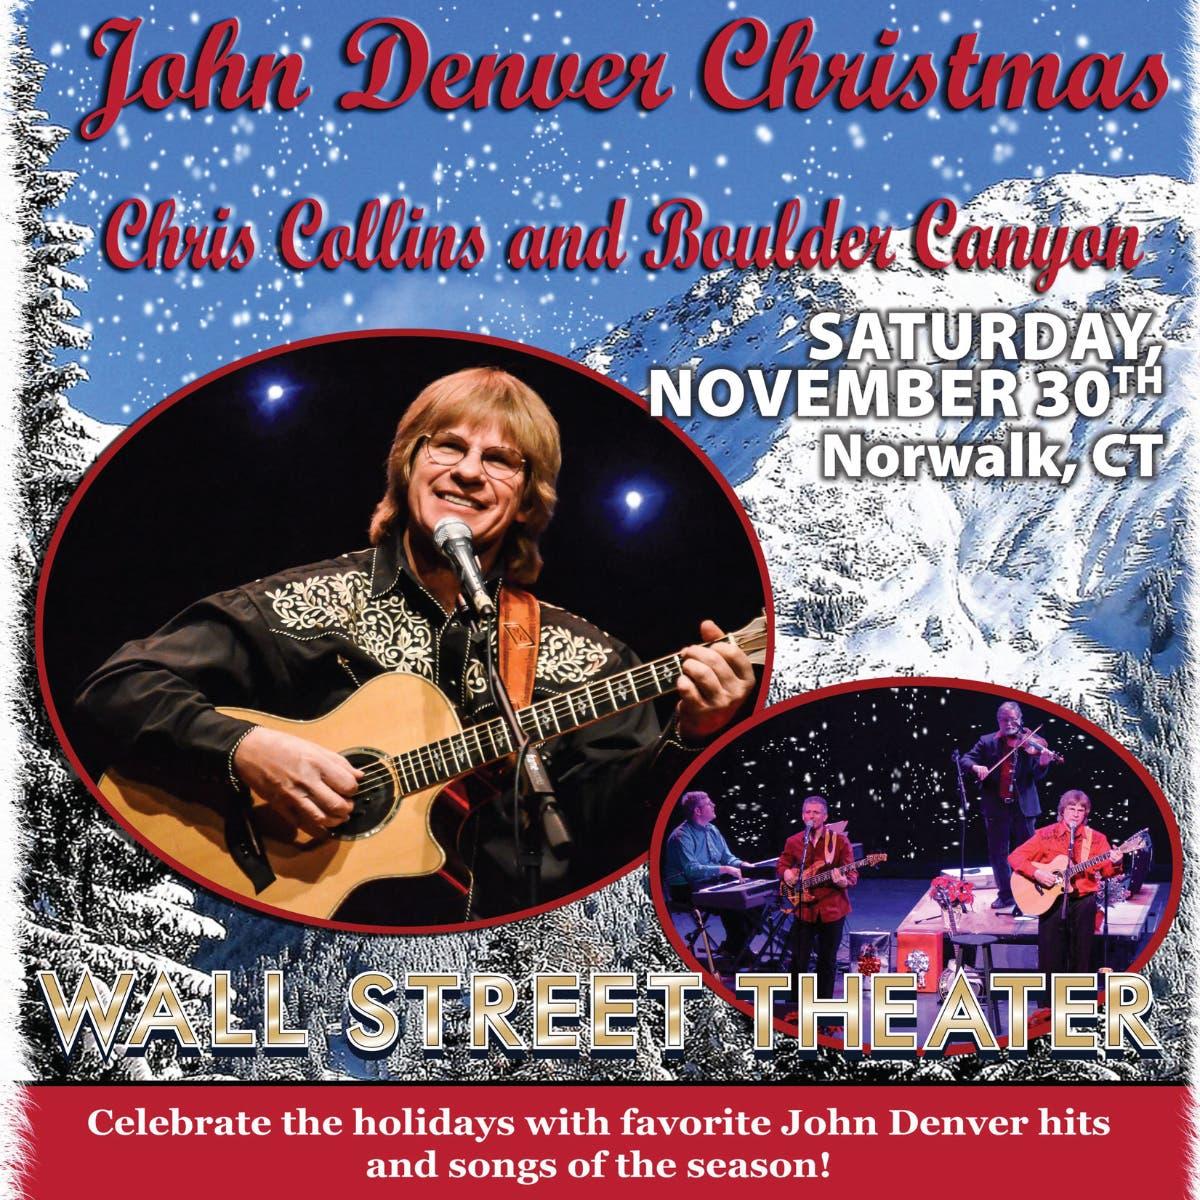 John Denver Christmas.Dec 31 Chris Collins And Boulder Canyon S John Denver